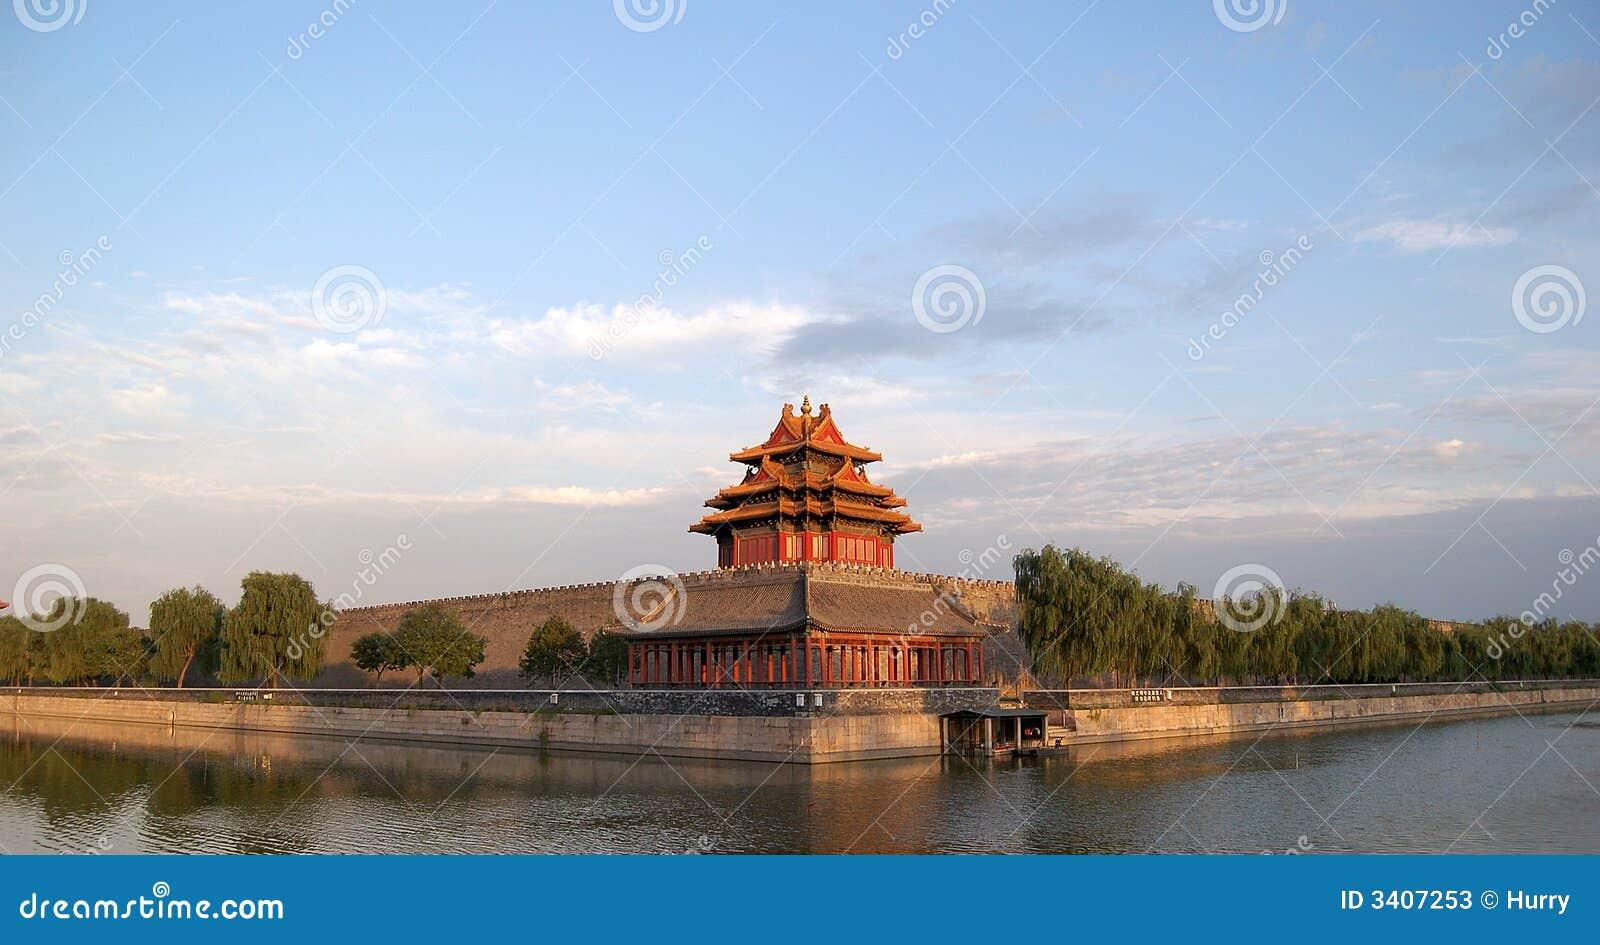 Turret, moat, Forbidden city